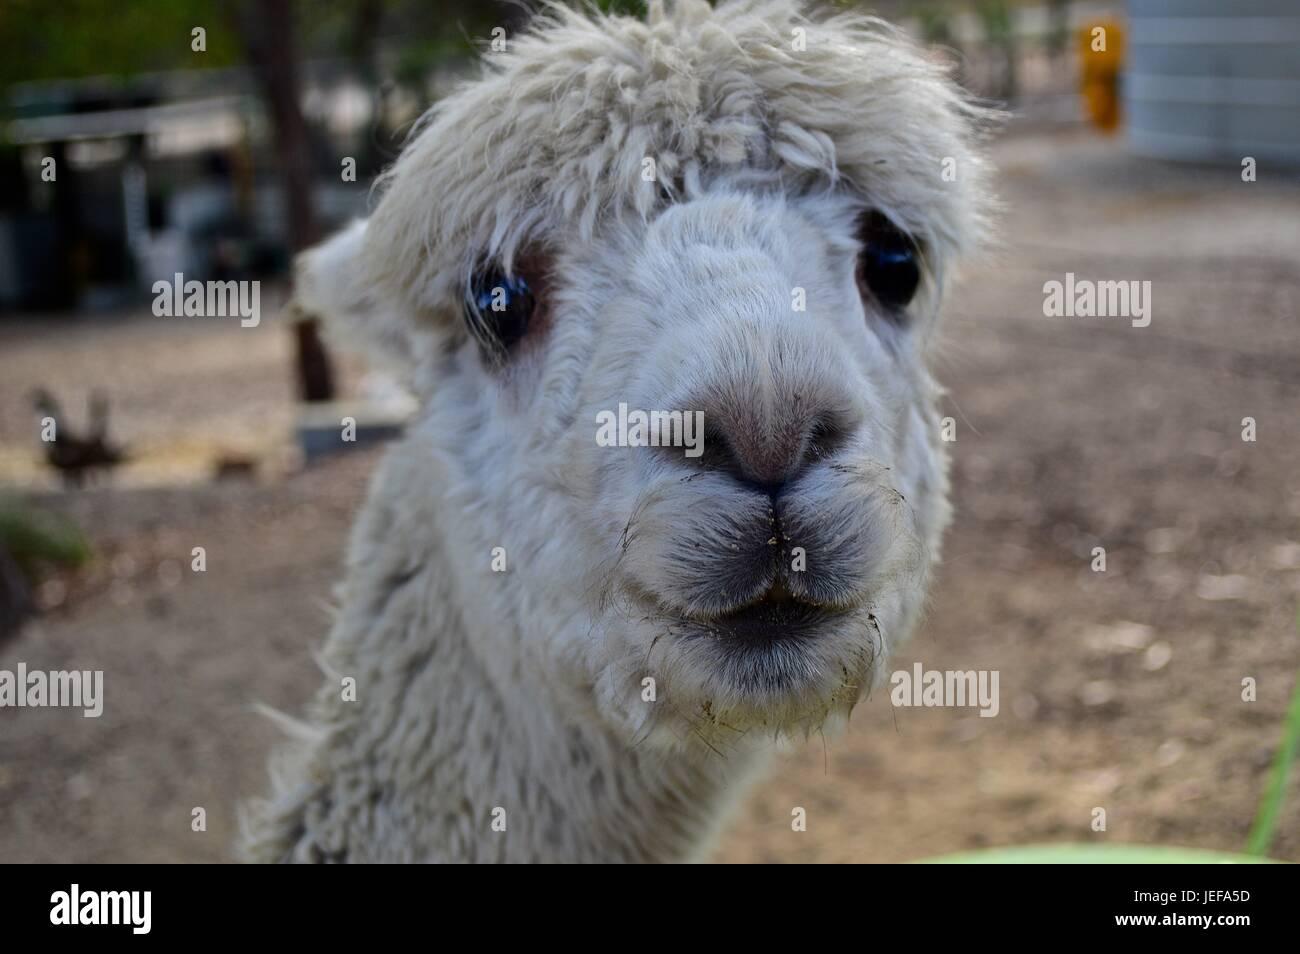 White suri alpaca face - Stock Image